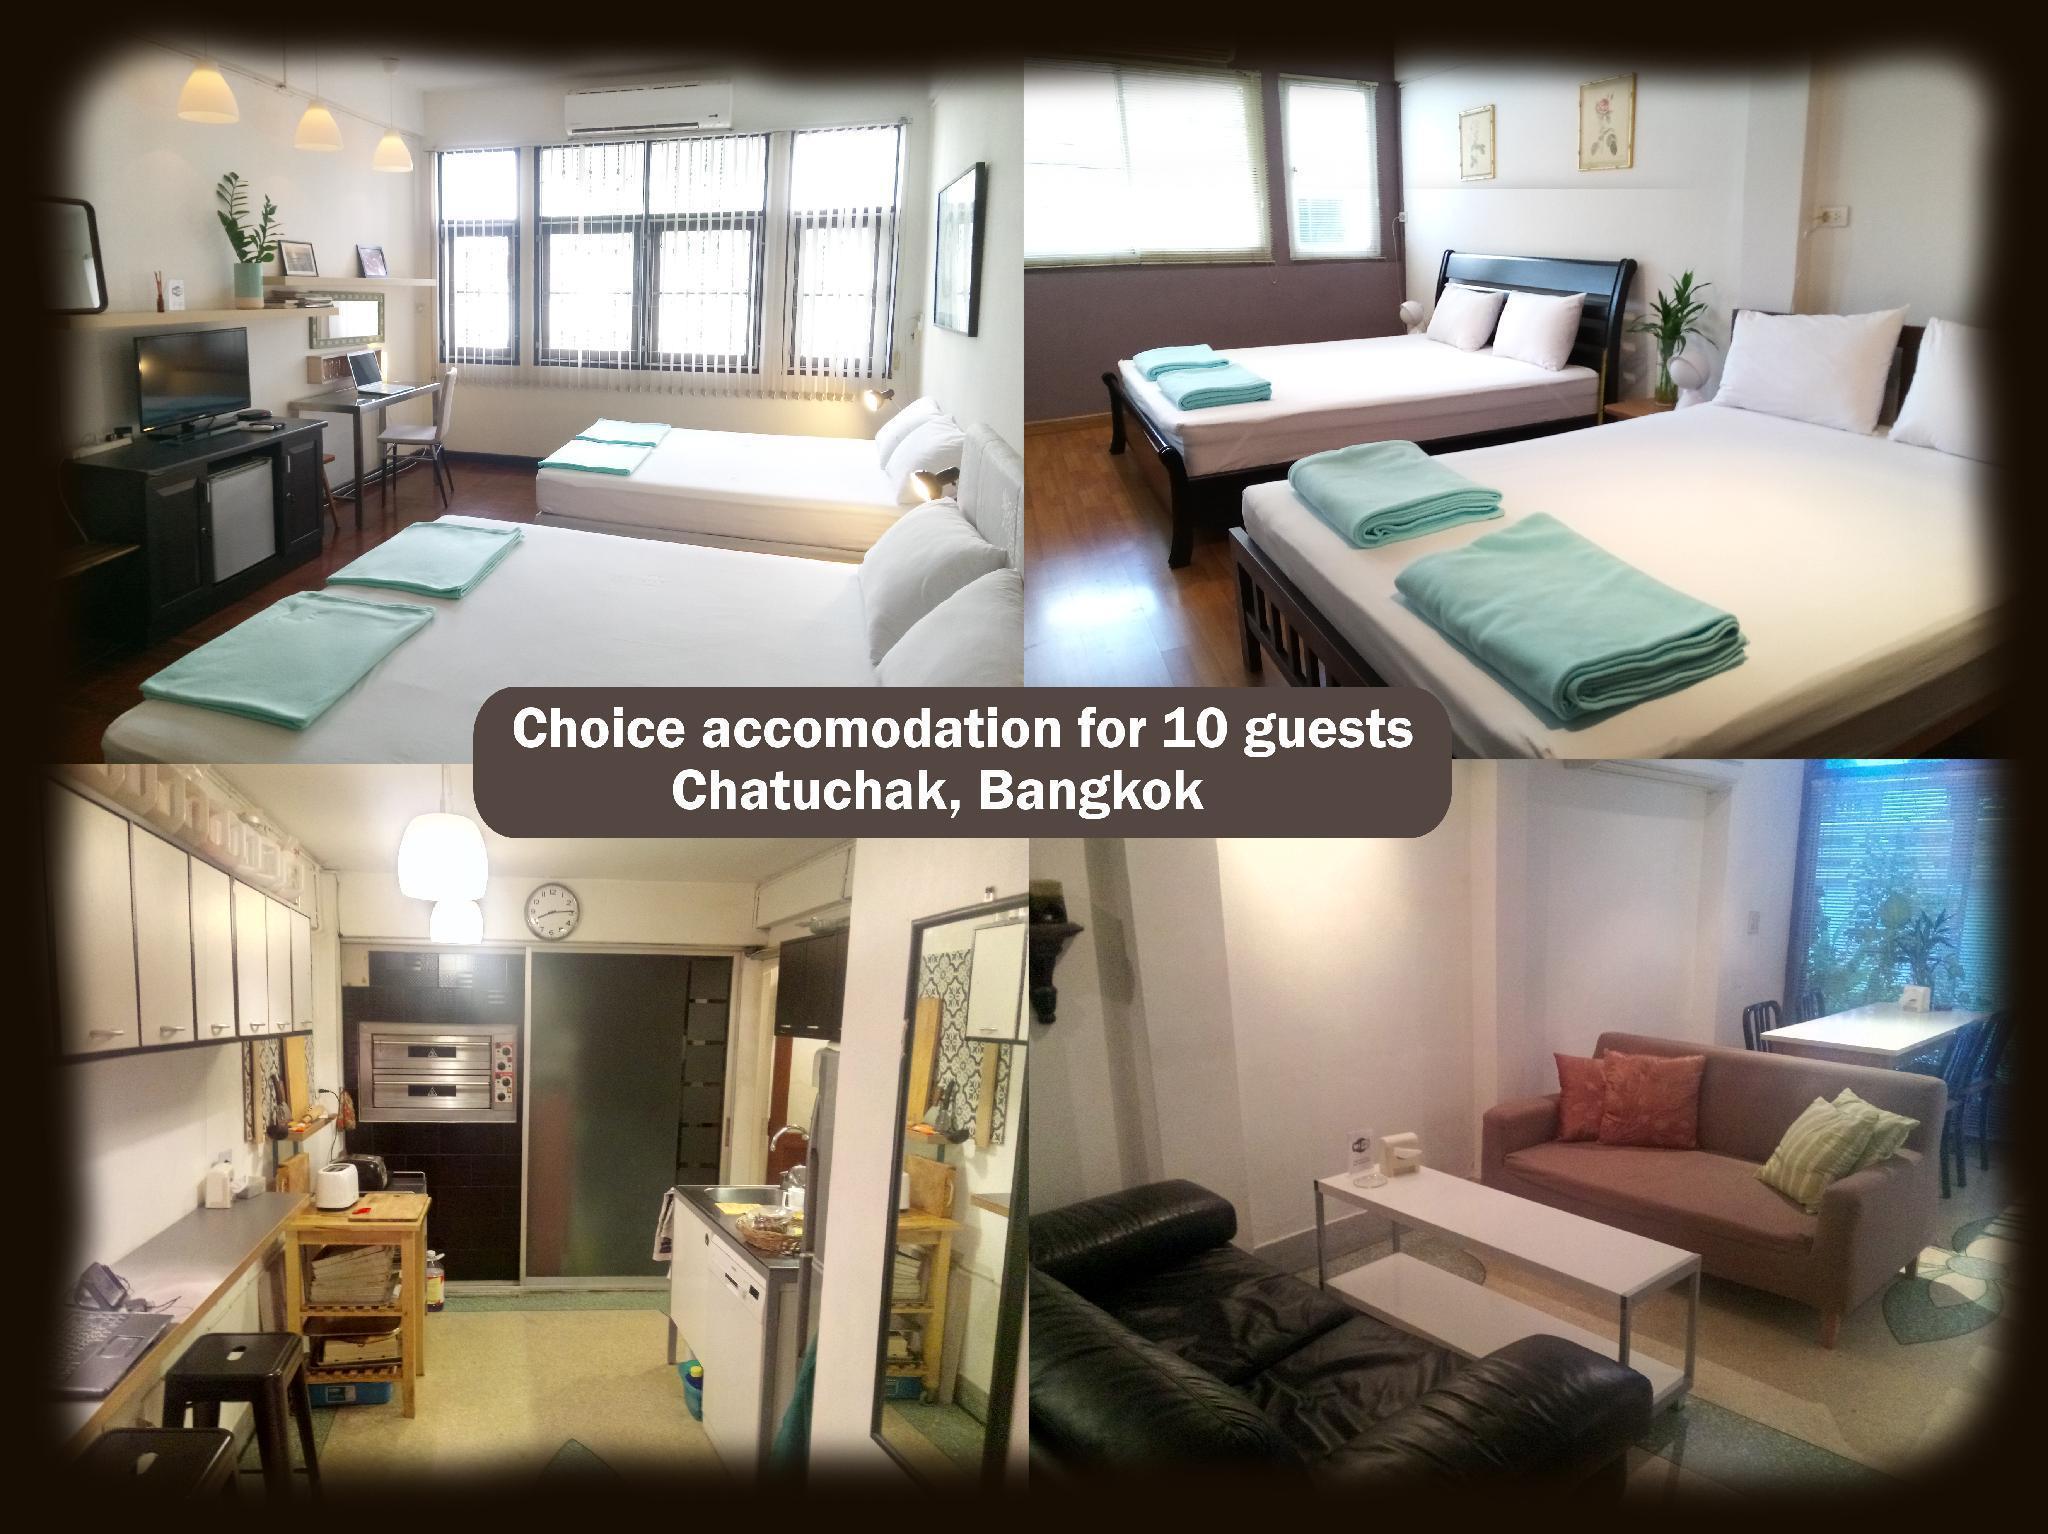 Two large rooms for ten people in Chatuchak area บ้านเดี่ยว 2 ห้องนอน 3 ห้องน้ำส่วนตัว ขนาด 110 ตร.ม. – รัชดาภิเษก